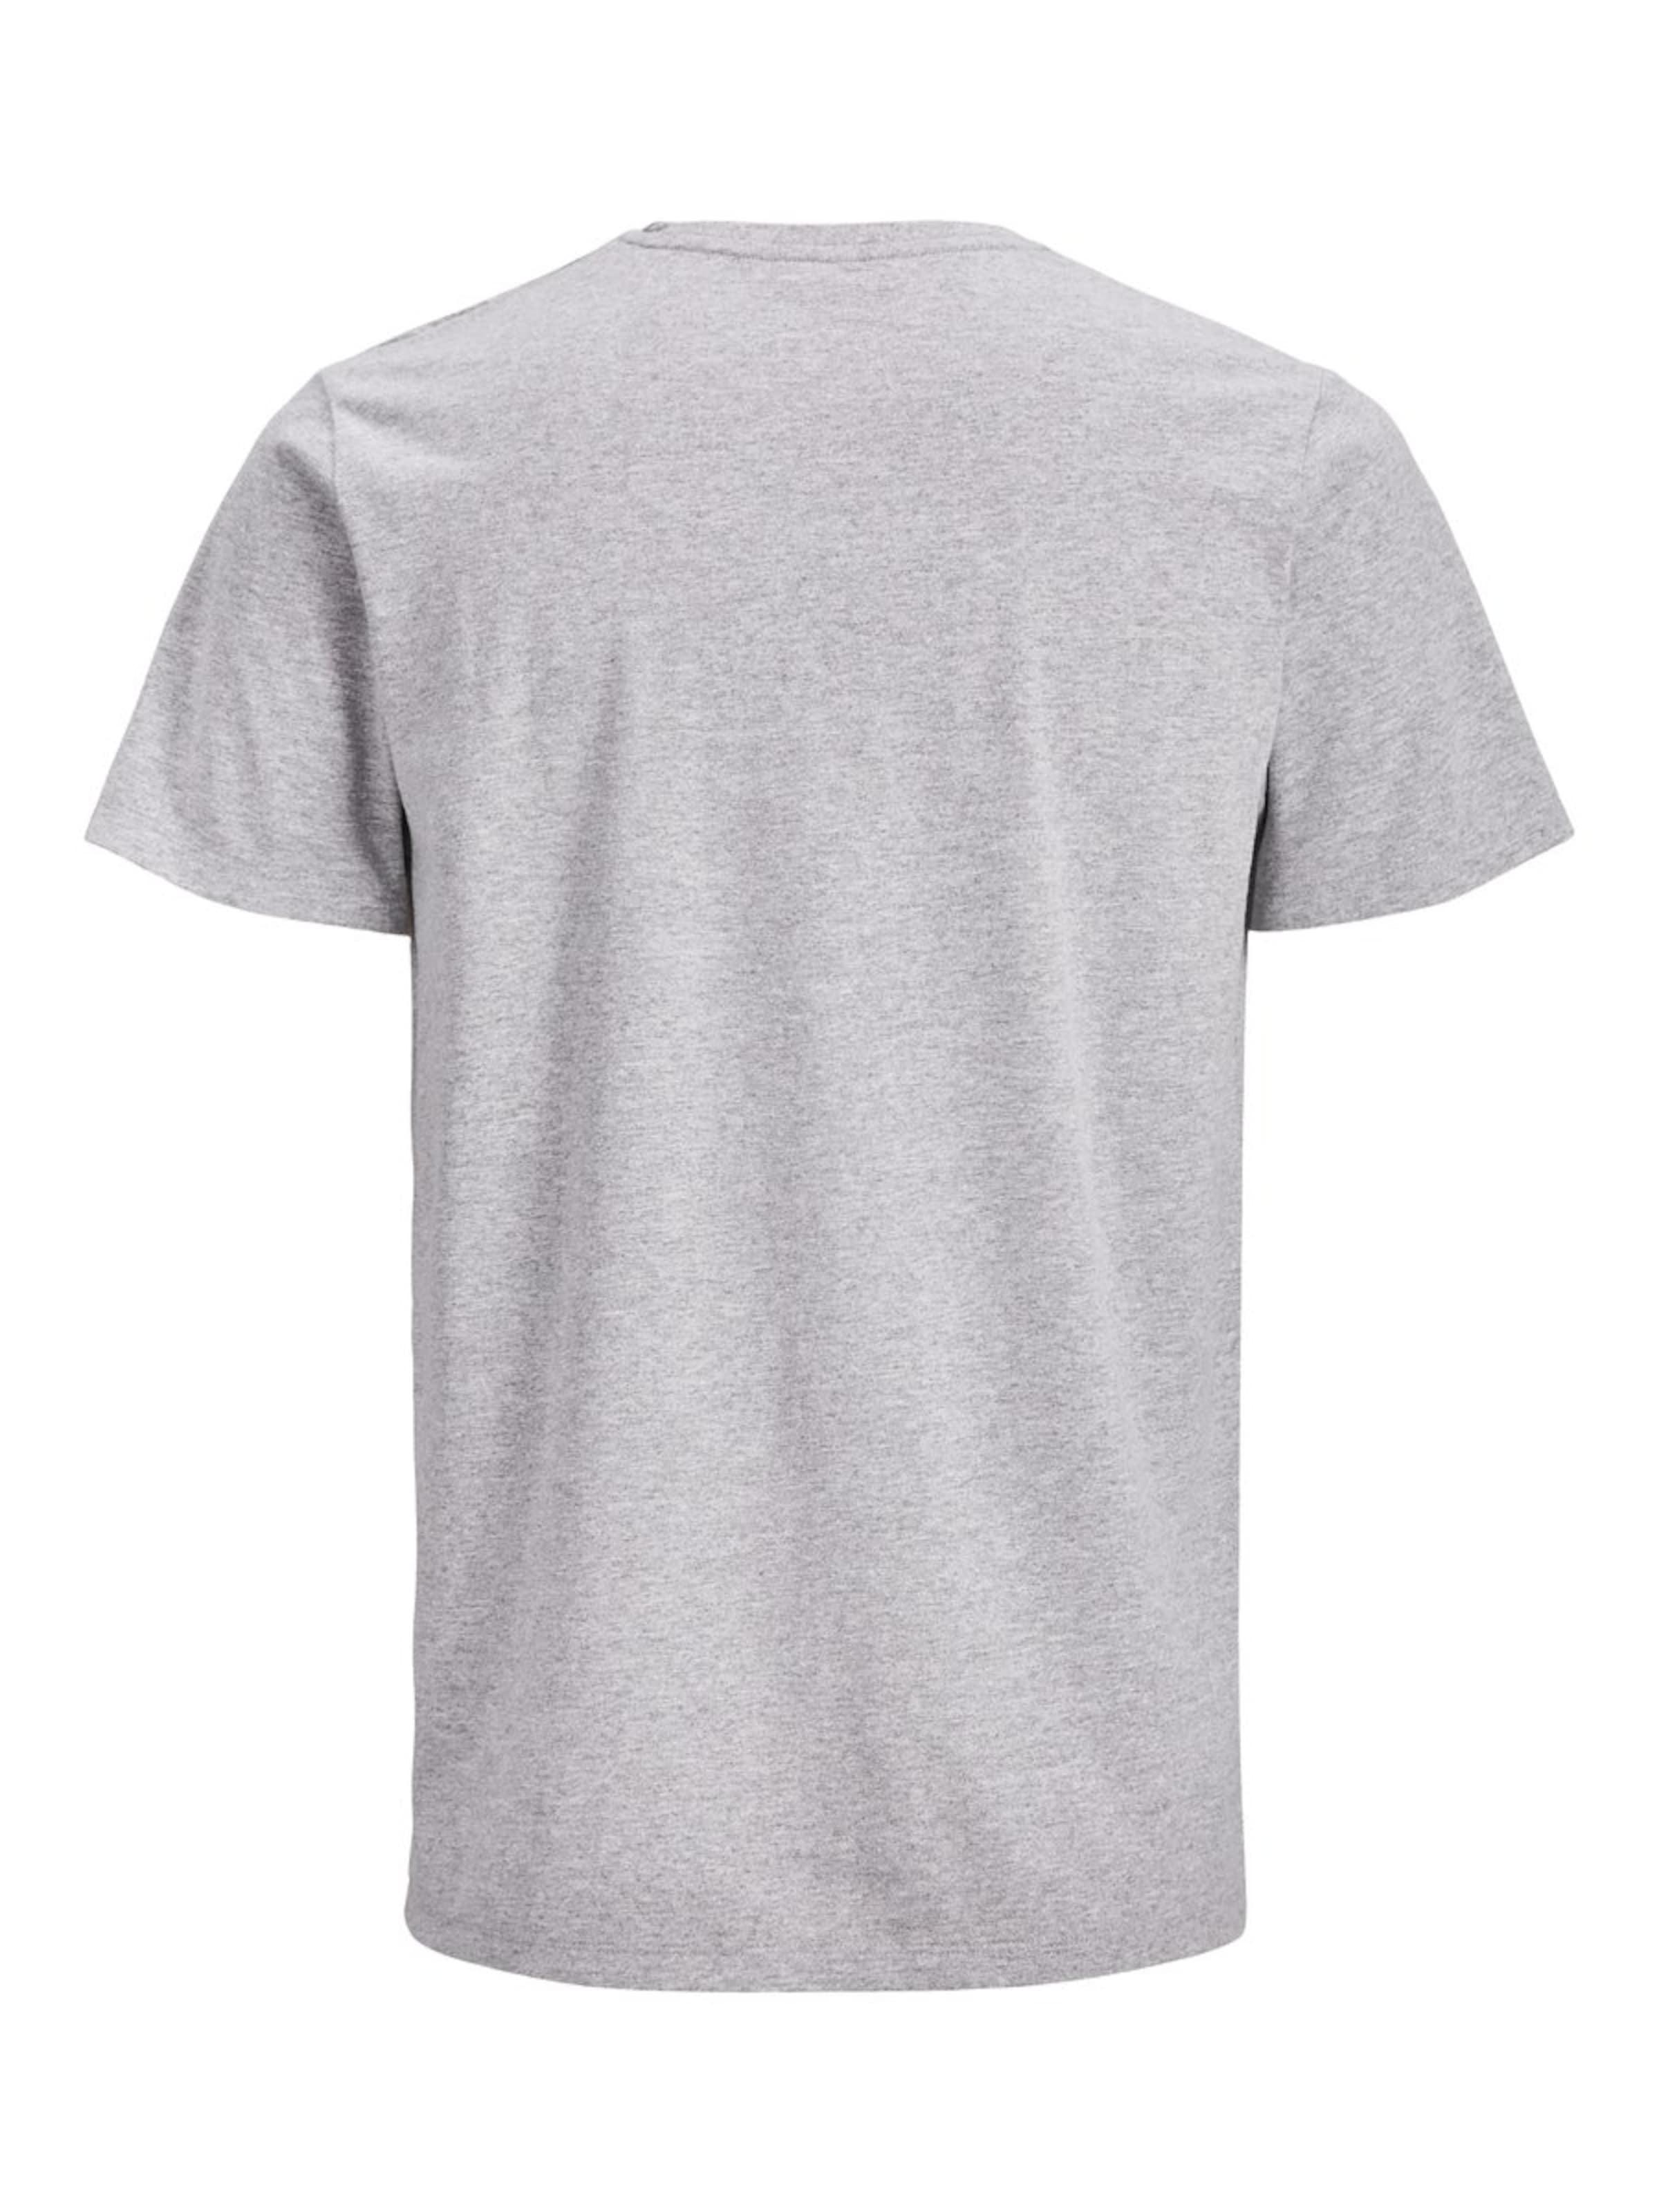 T shirt Jones In GrauMischfarben Jackamp; 35LjR4A